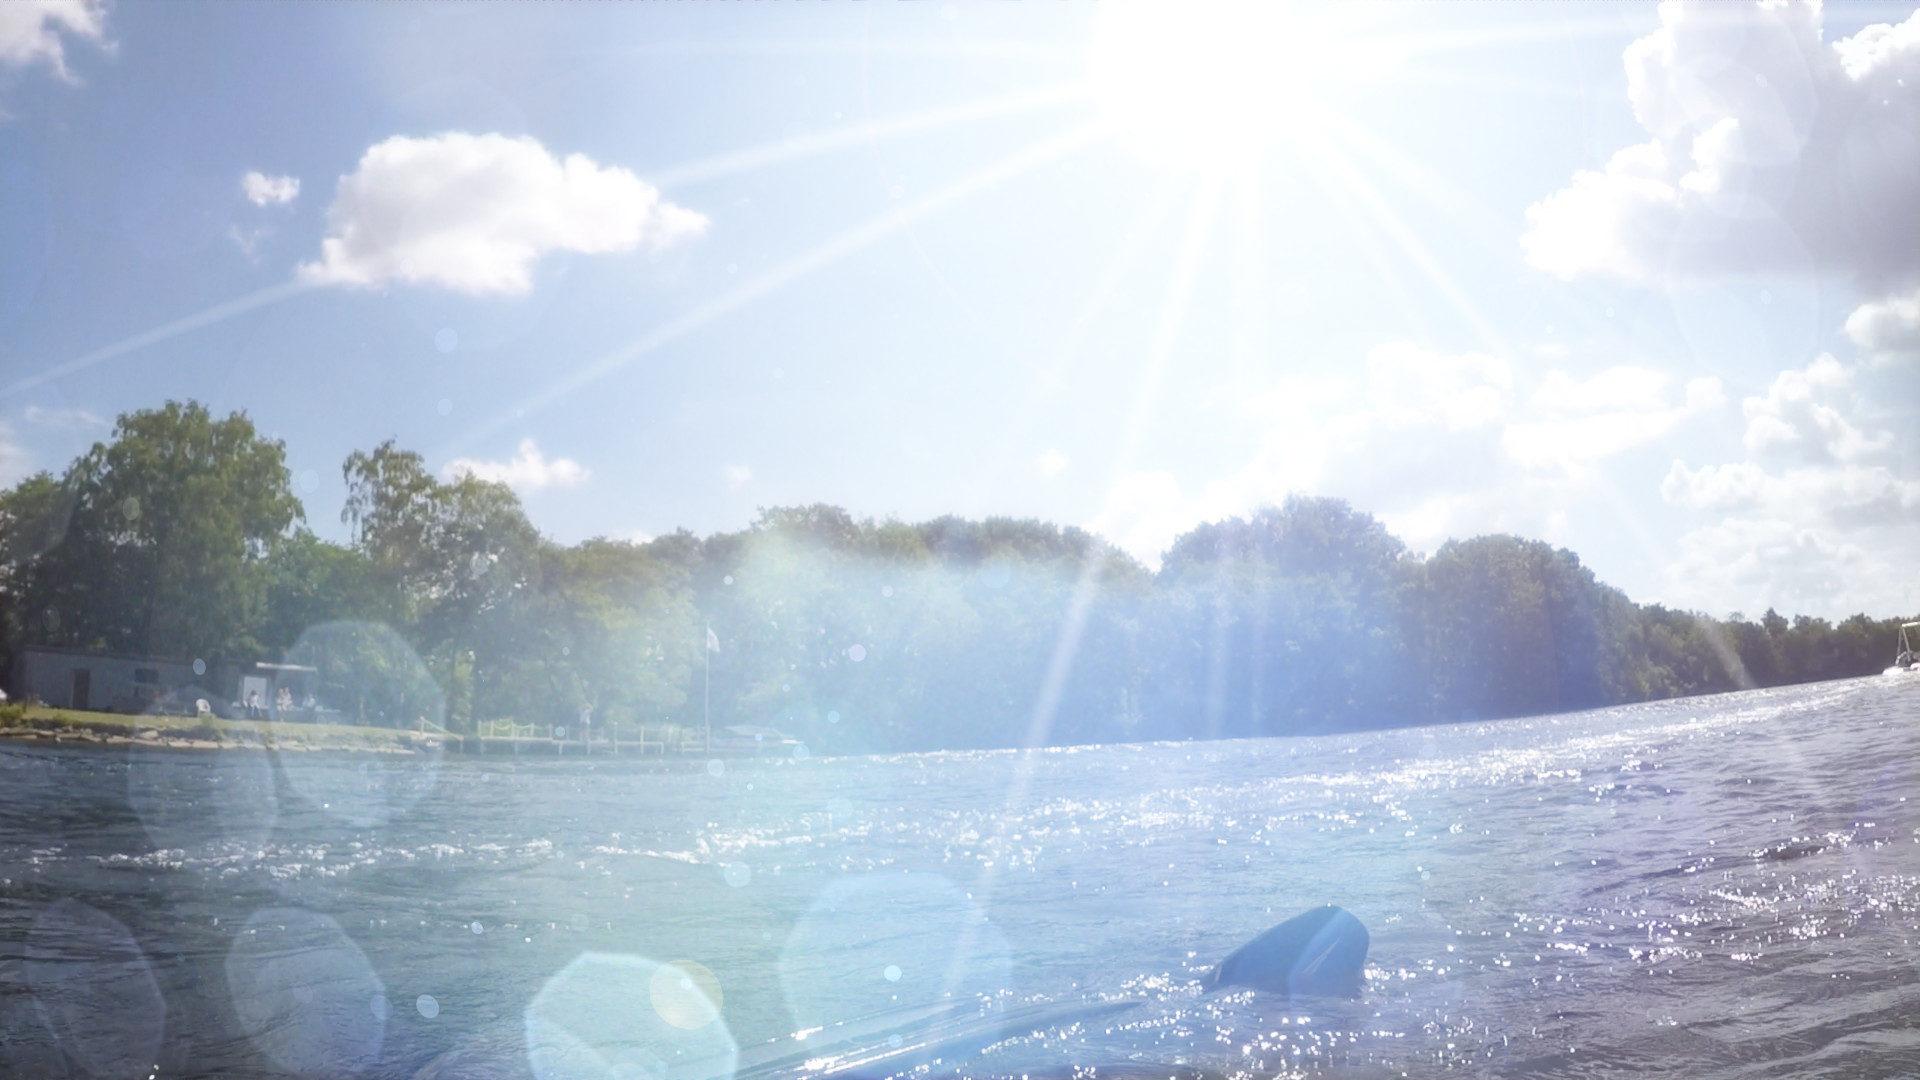 GoPro lens footage - reapplying lens blur